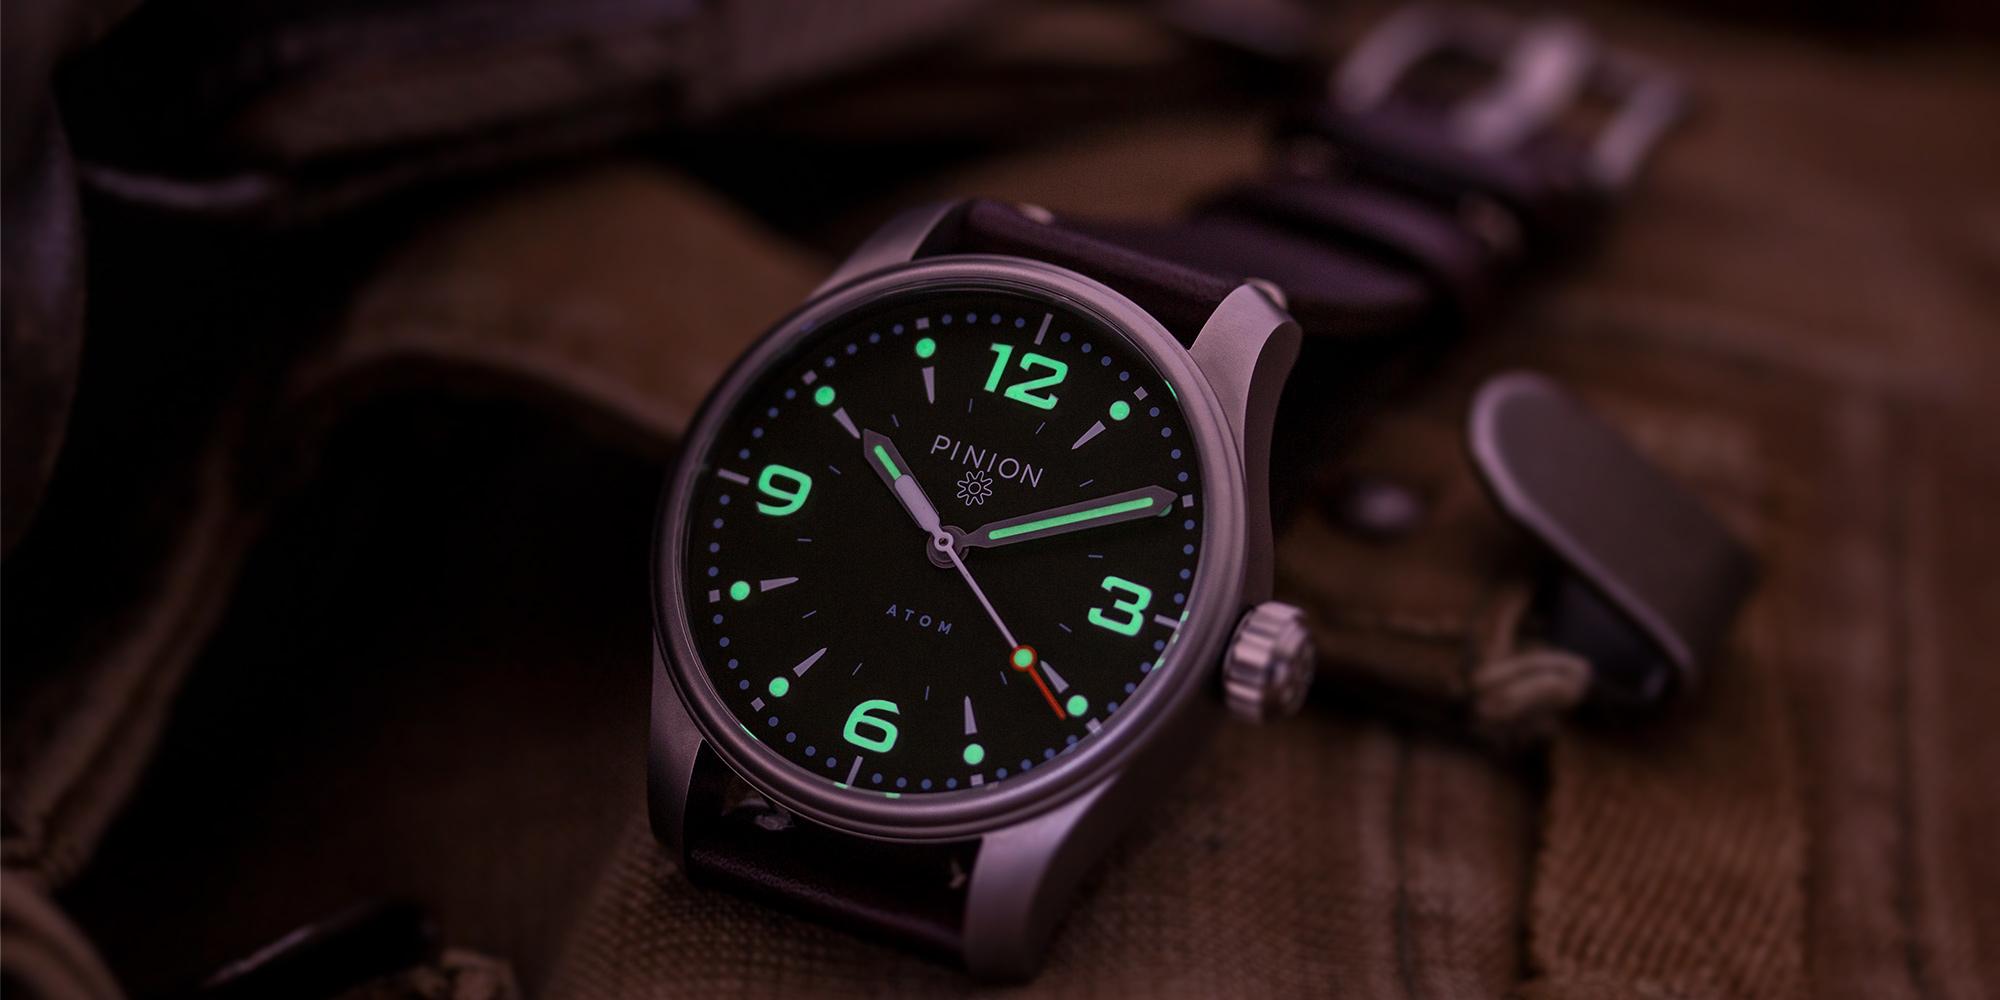 Pinion-Atom-39-no-date-watch-hunter-green-002-b